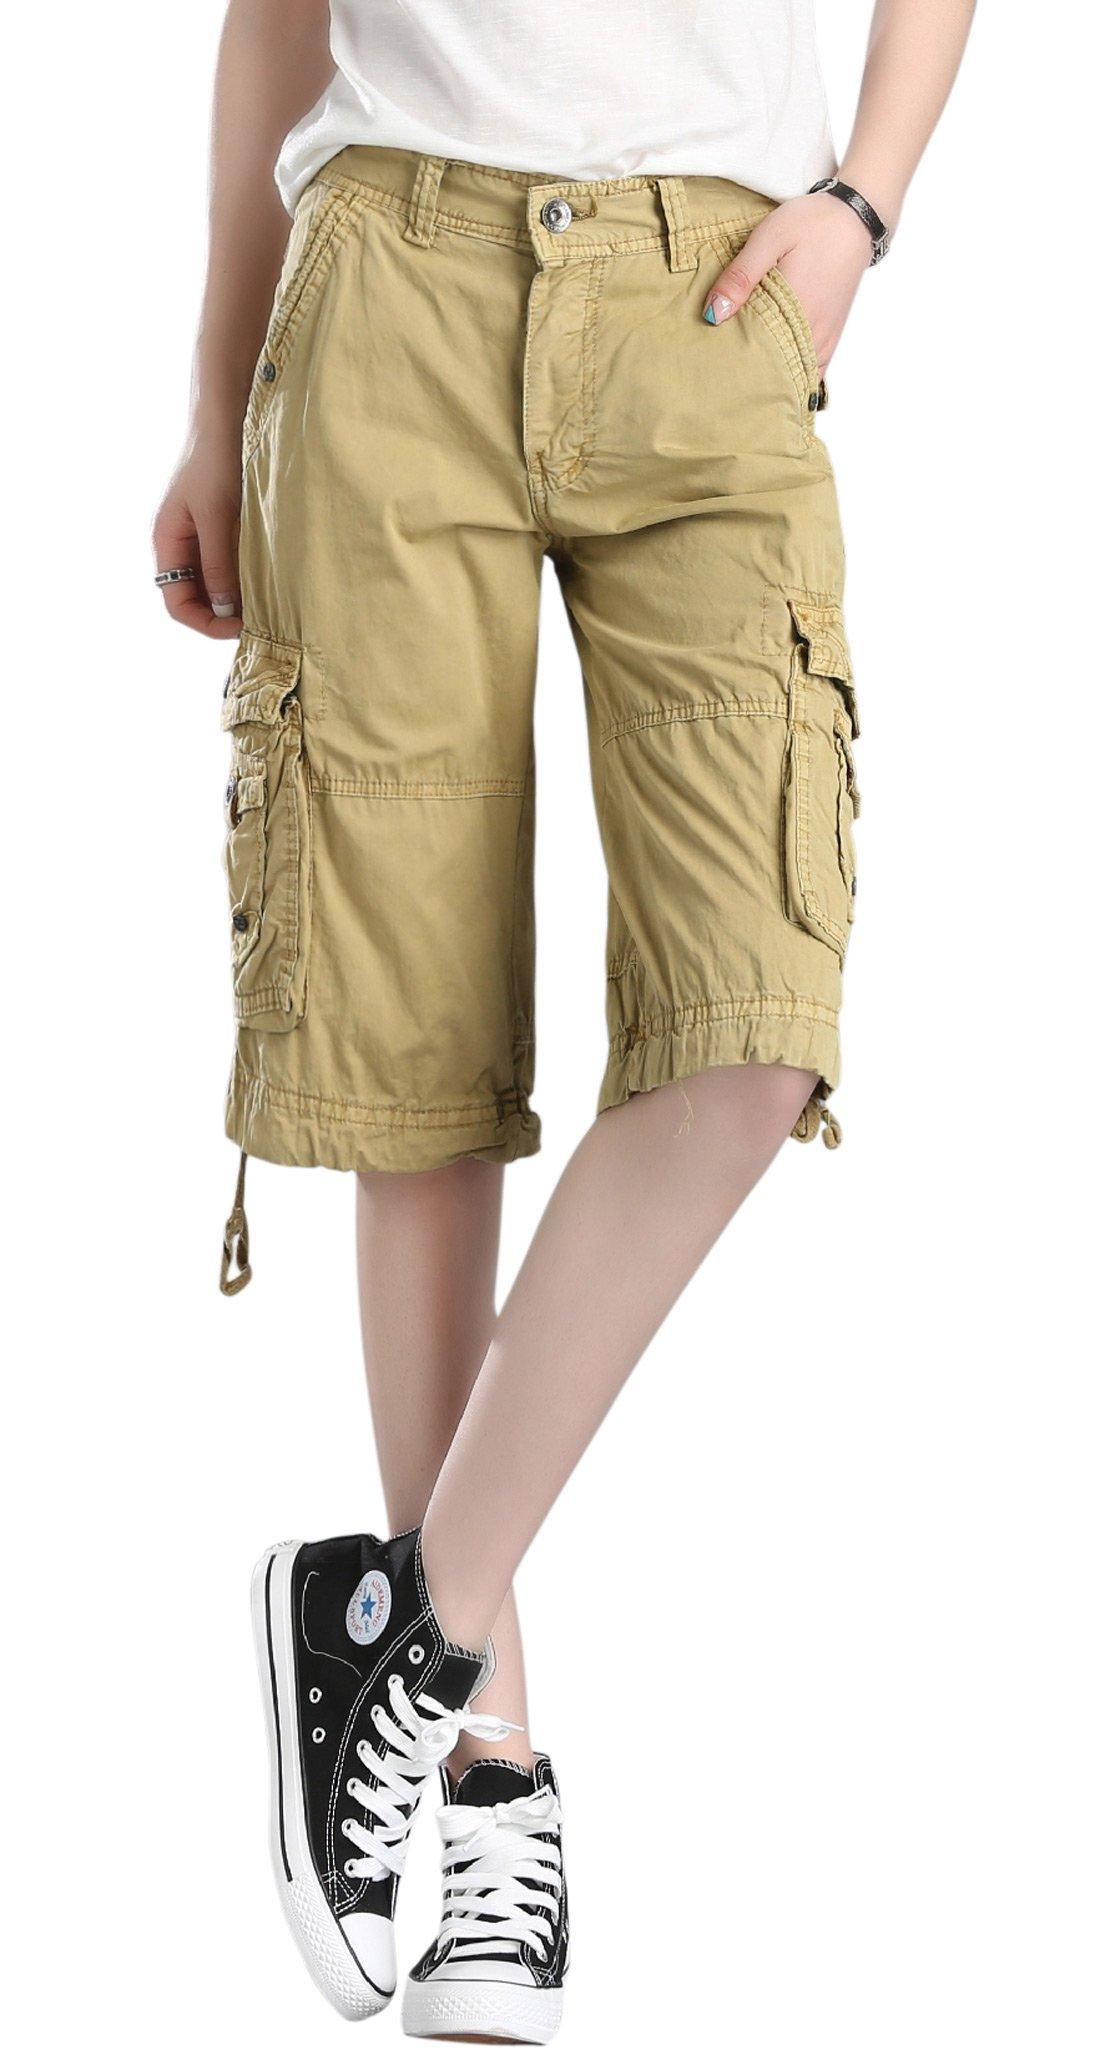 Chouyatou Women's Casual Multi-Pockets Sports-Wear Knee Length Cargo Shorts (XX-Large, Khaki)